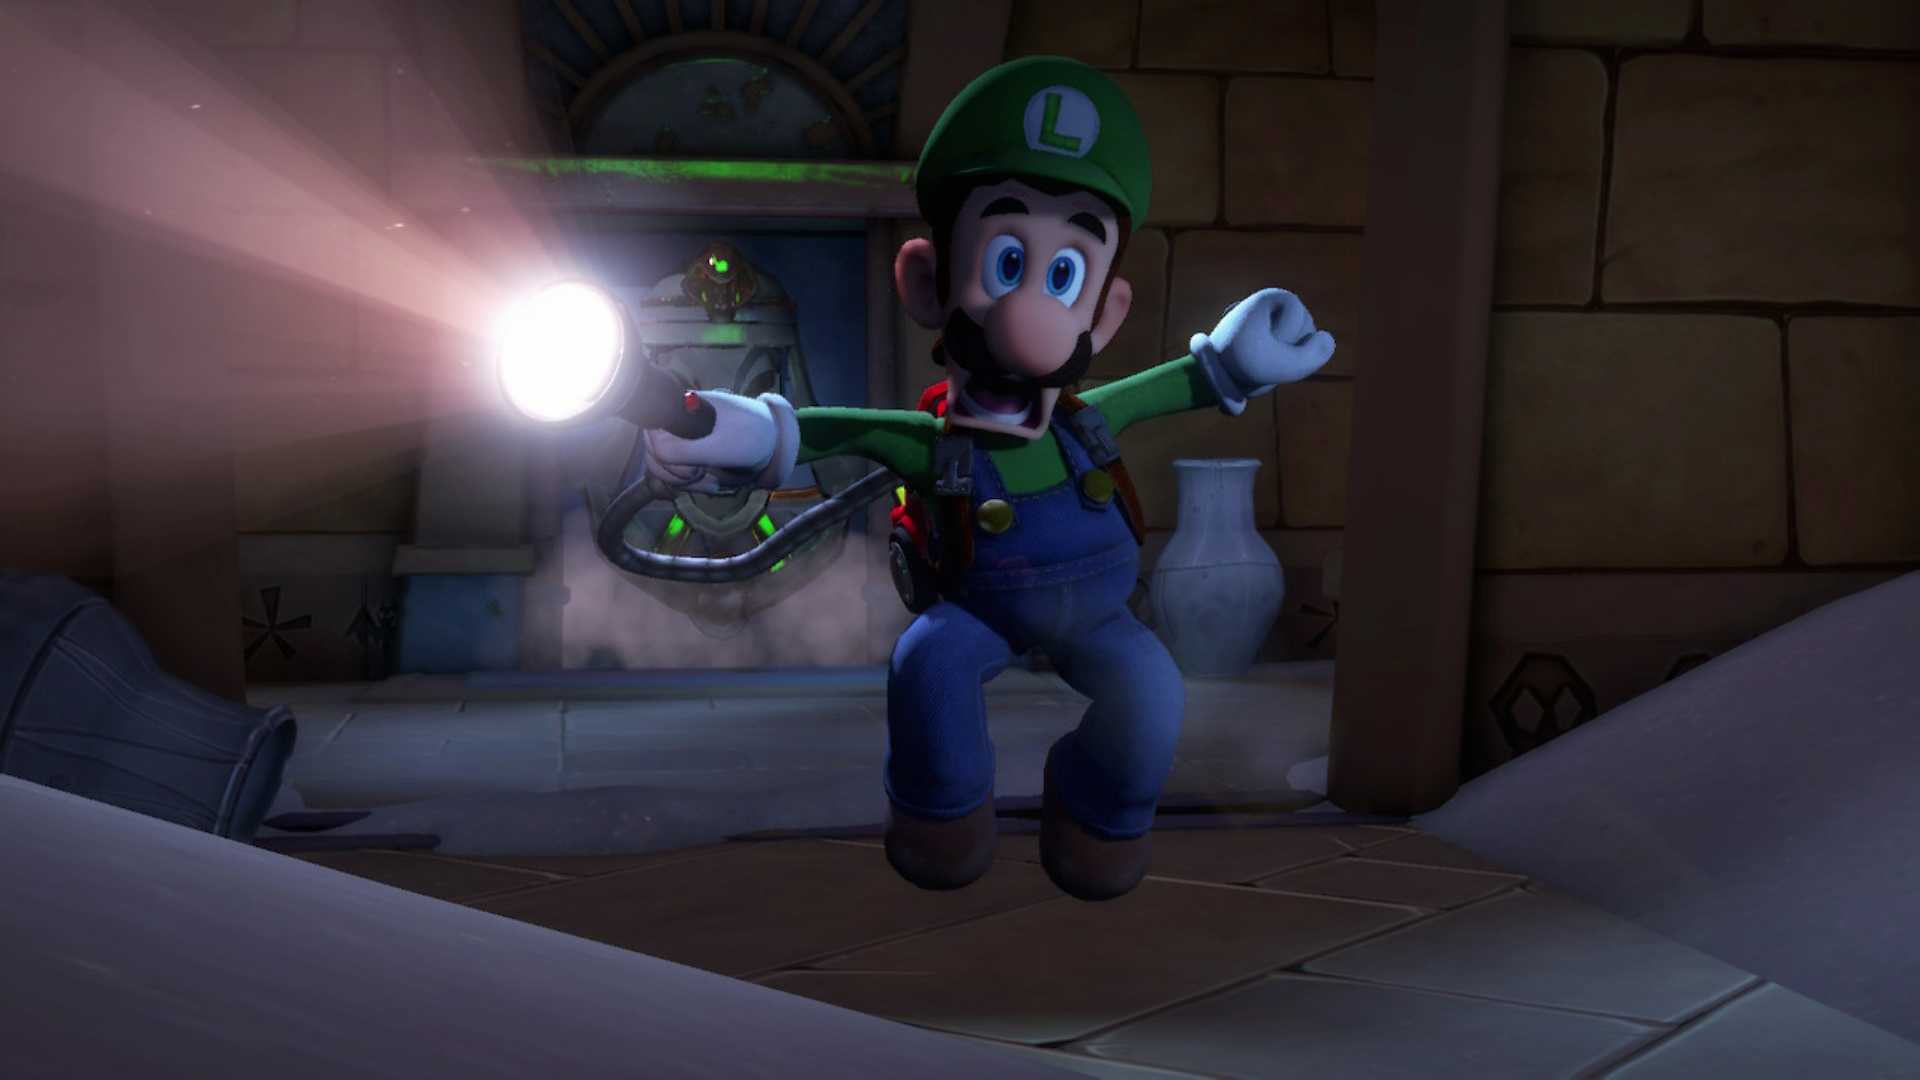 Luigi's Mansion 3 Golden Ghosts: How to